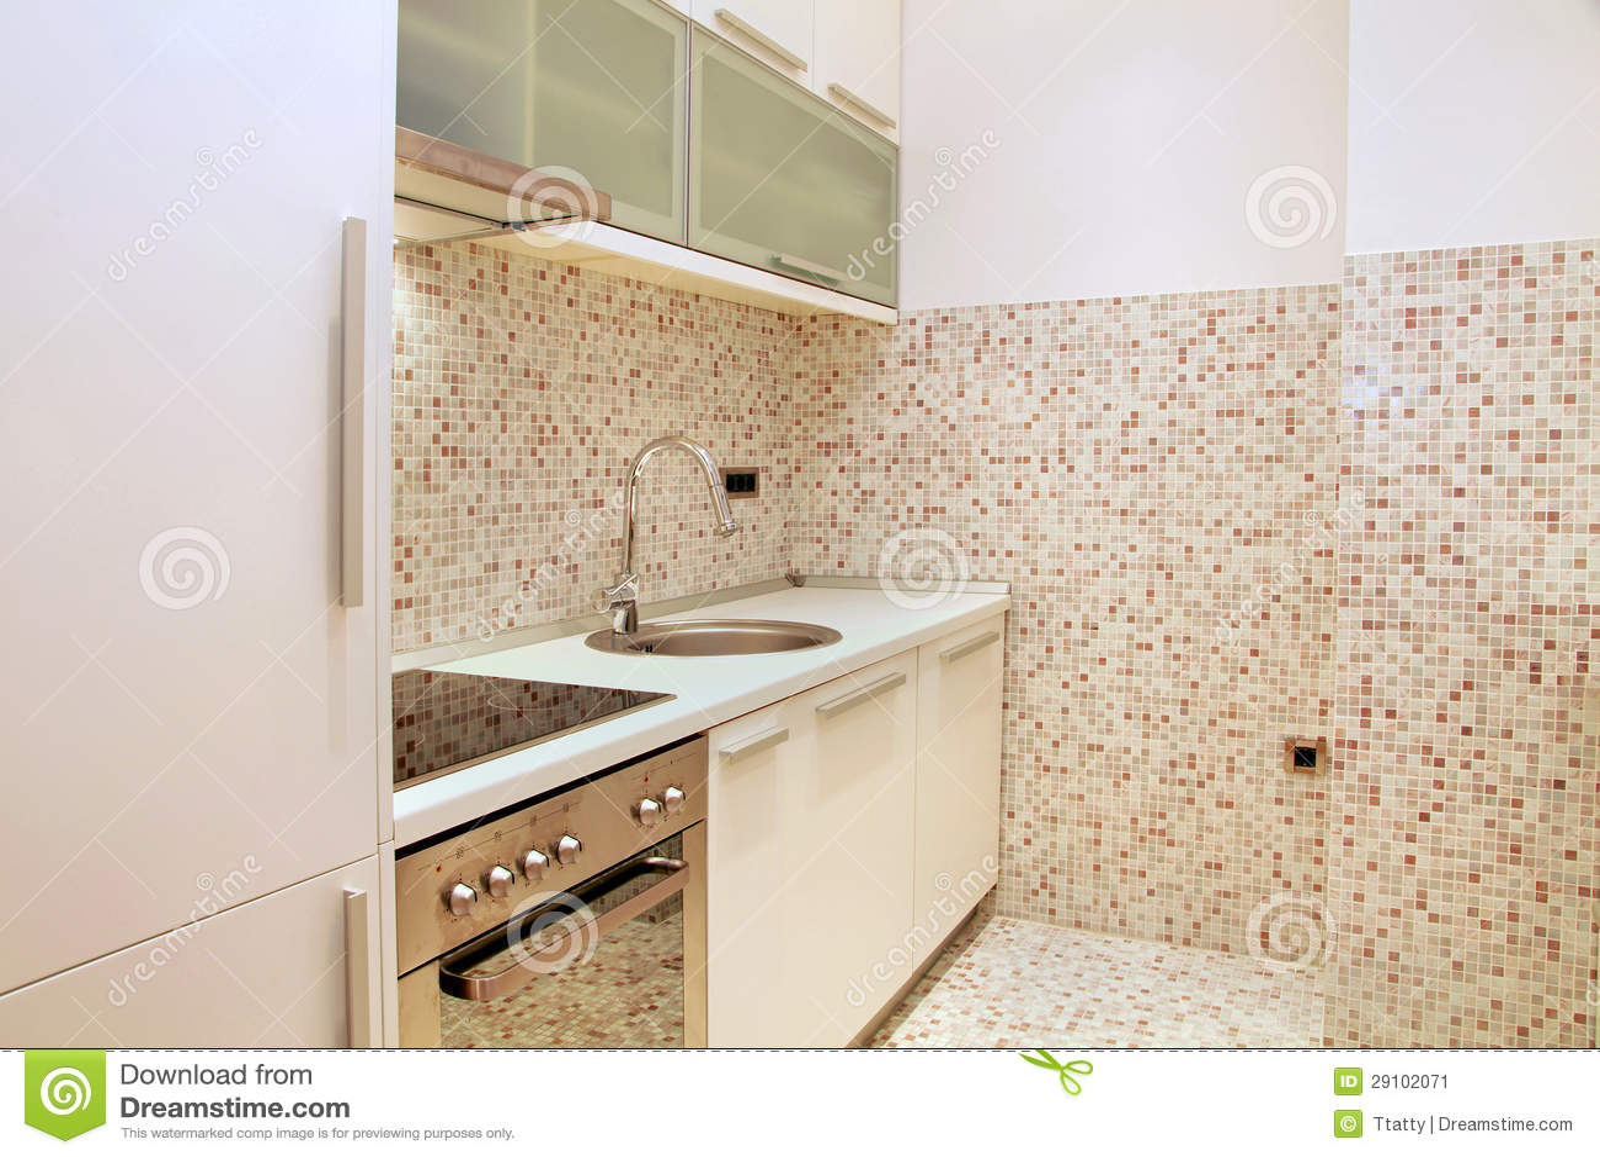 Piastrelle per cucina good mattonelle cucina in muratura